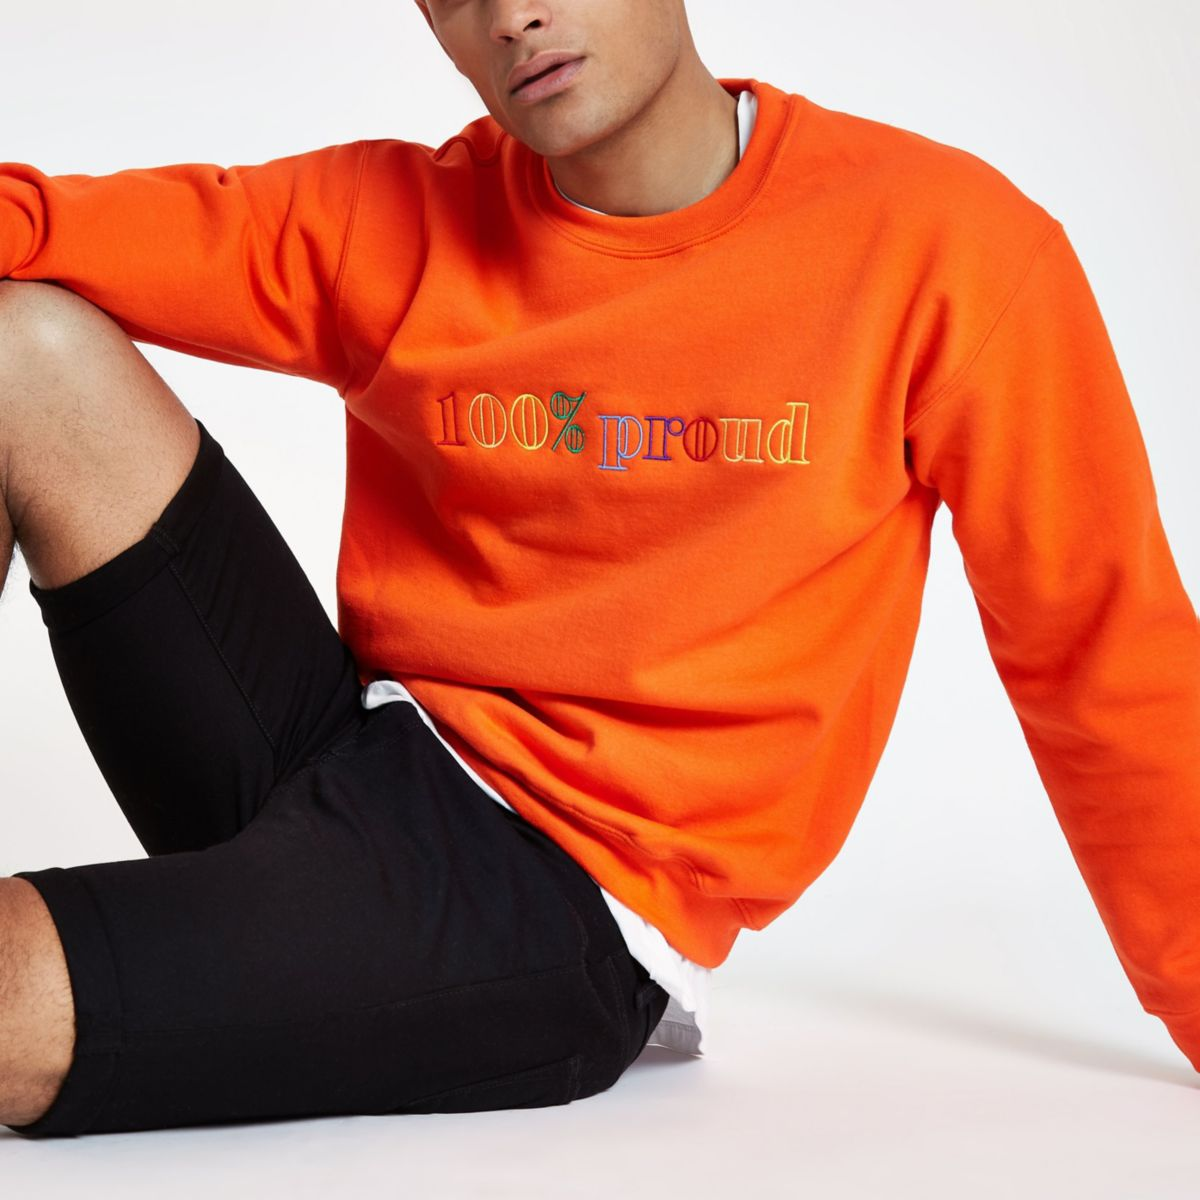 Orange Pride '100% proud' sweatshirt